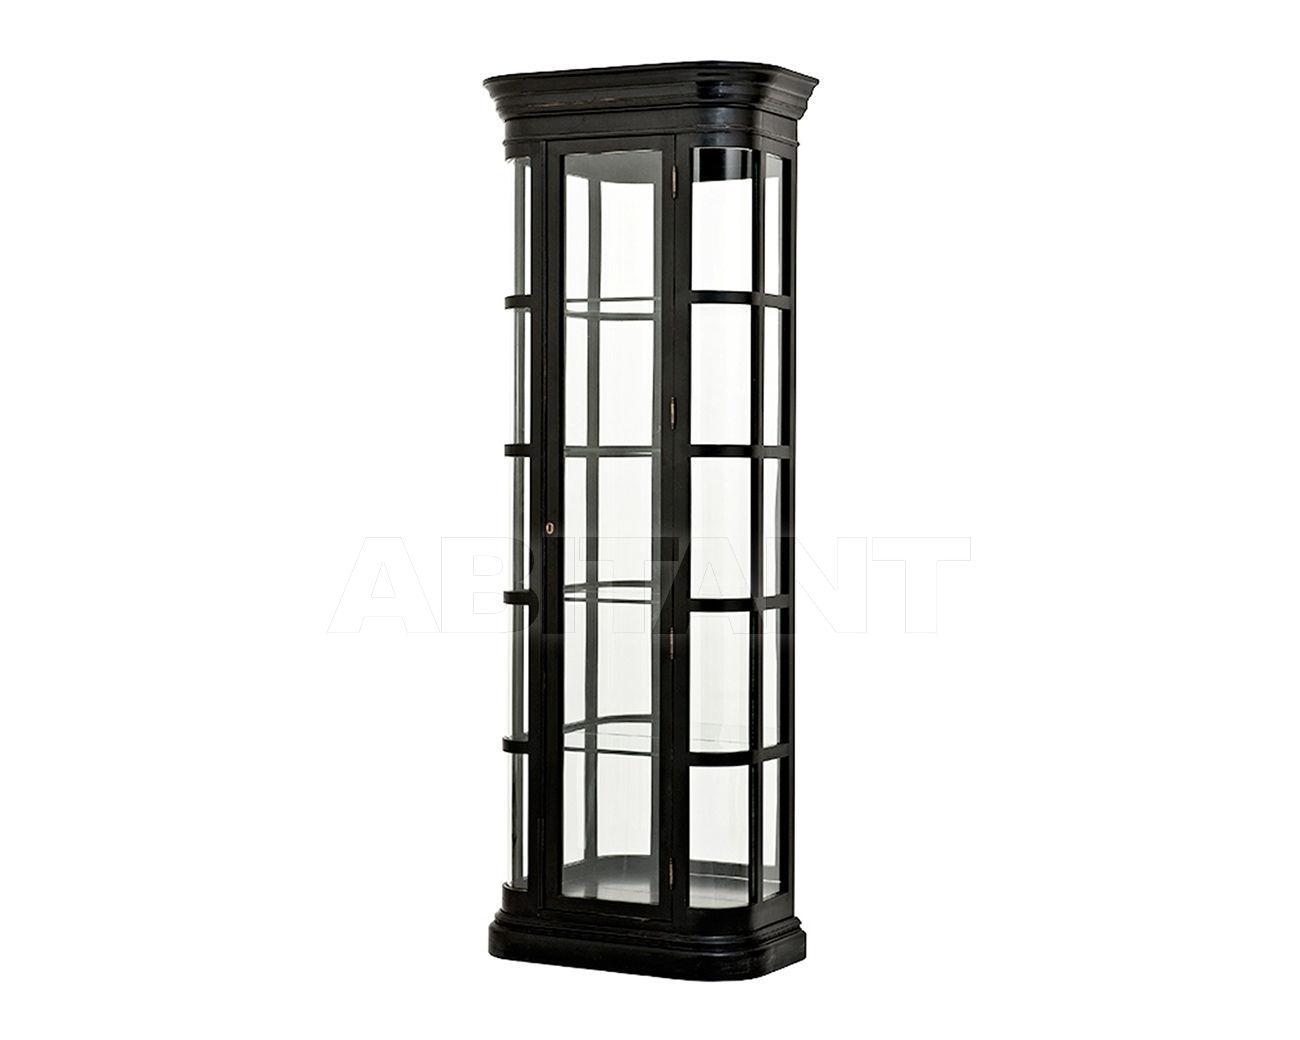 Купить Витрина Omnibus Eichholtz  Cabinets 108152